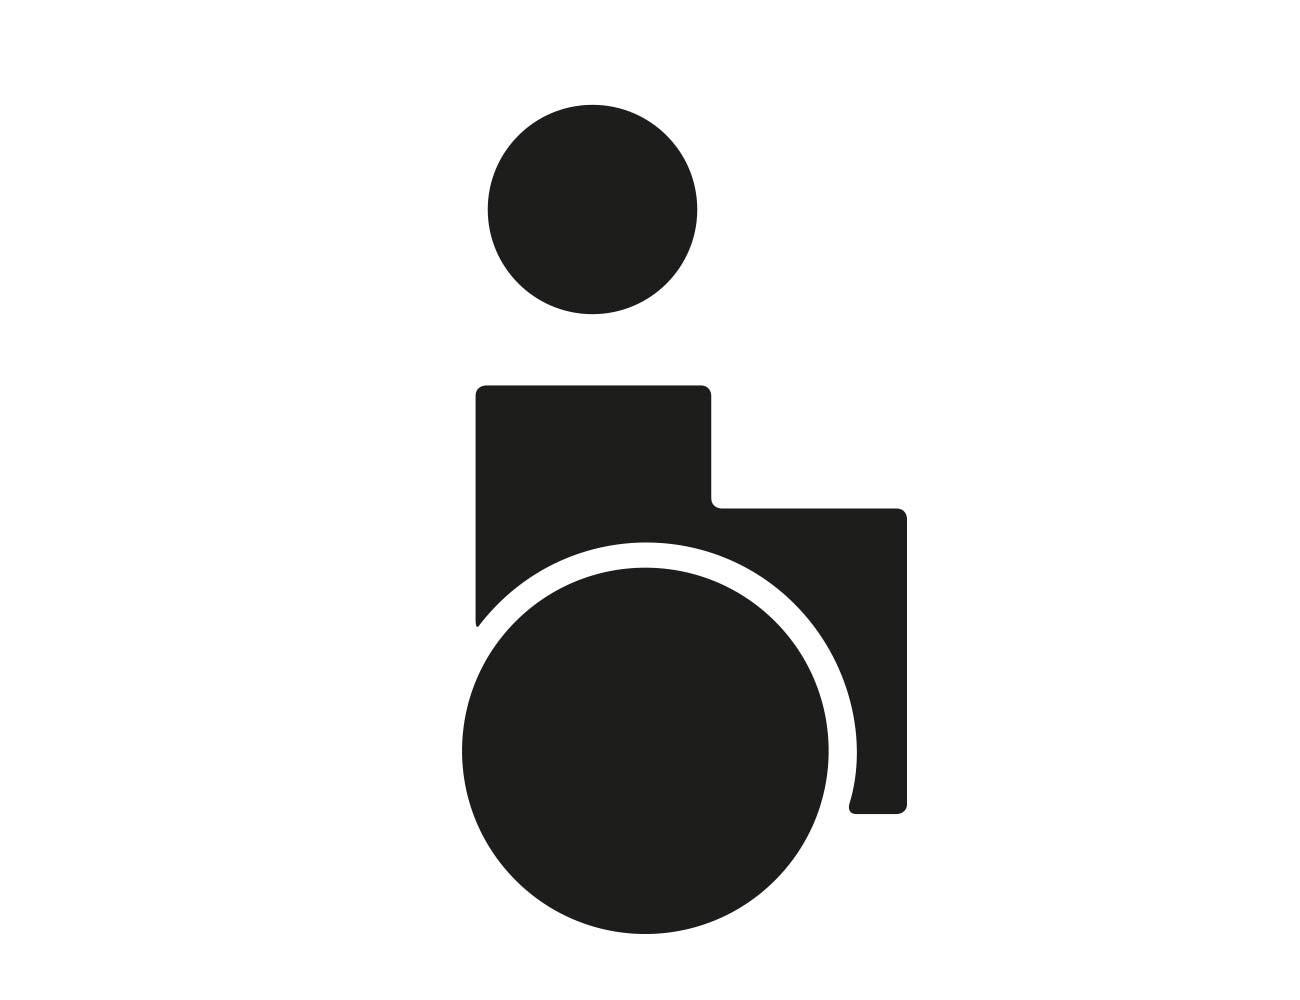 WC Piktogramm Acrylglas Rollstuhl